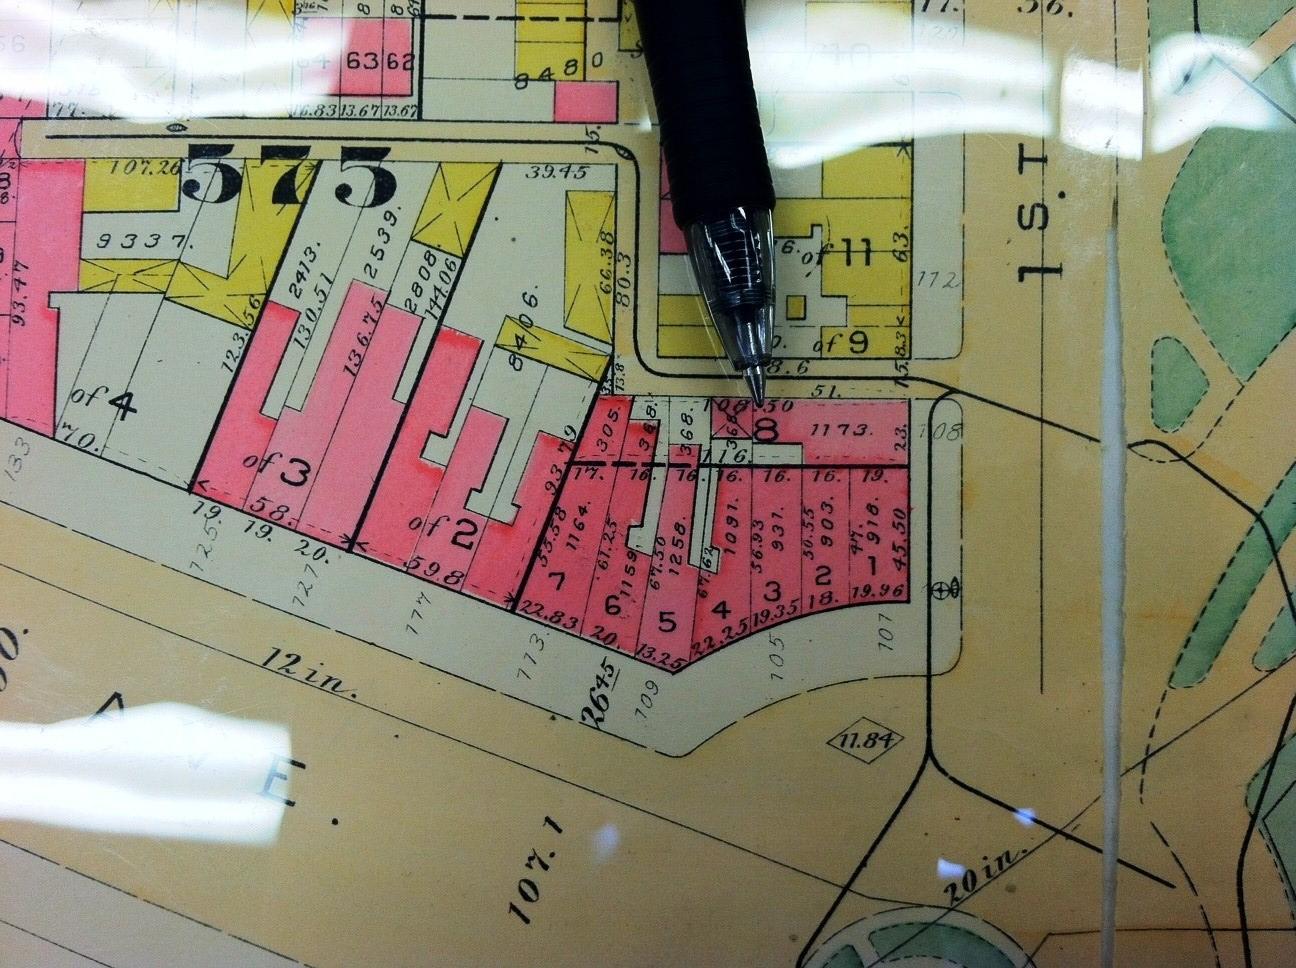 1892 Baist Map Vol 1 Plate 43 Old Curiosity Shop 105